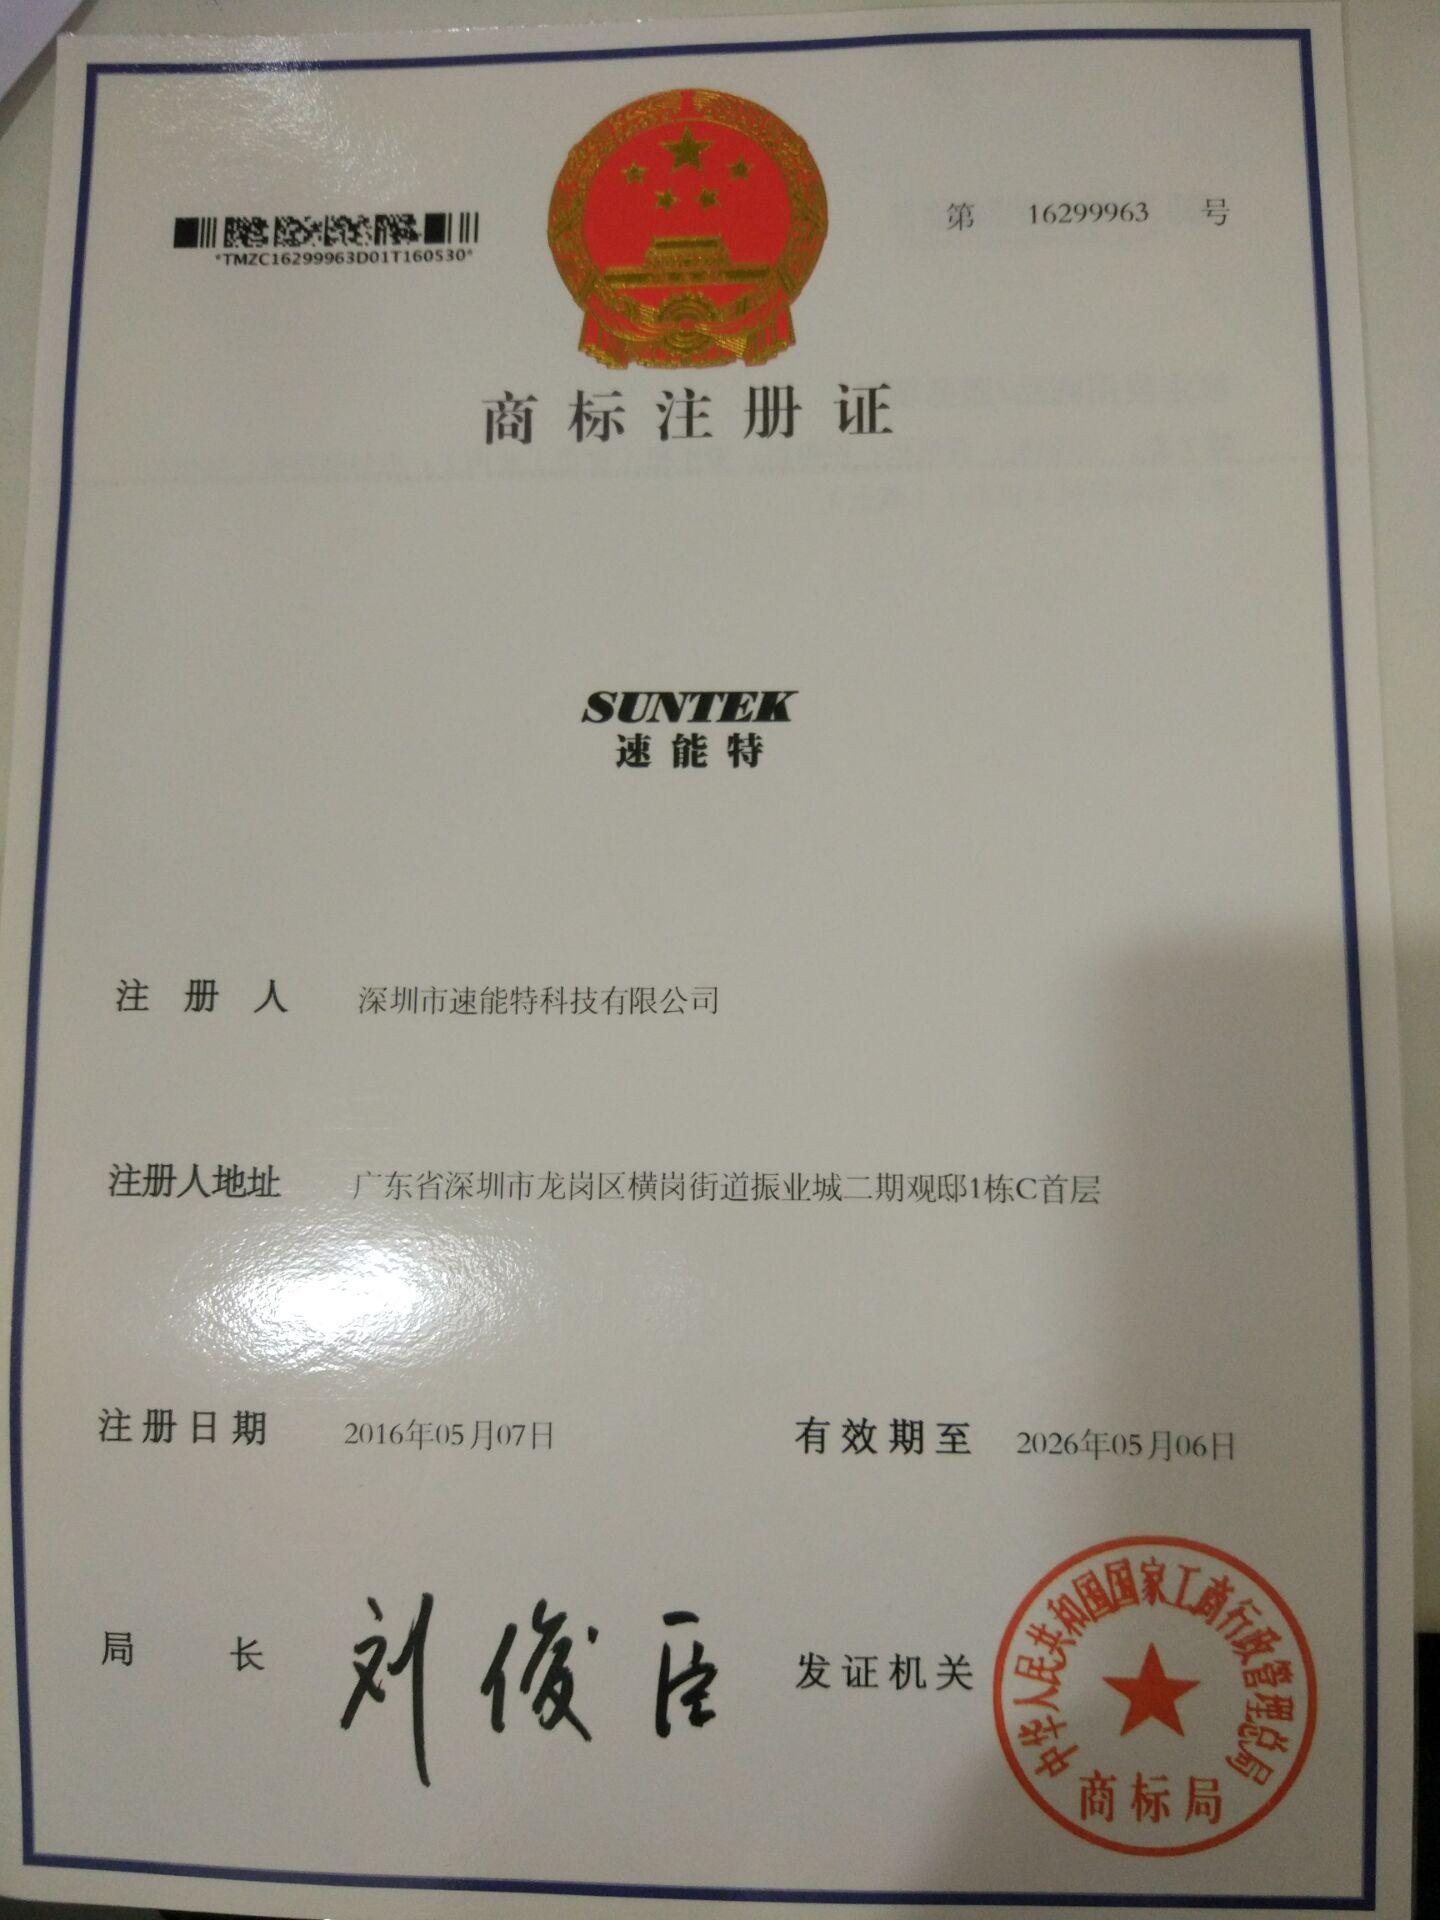 Suntek trademark certificate